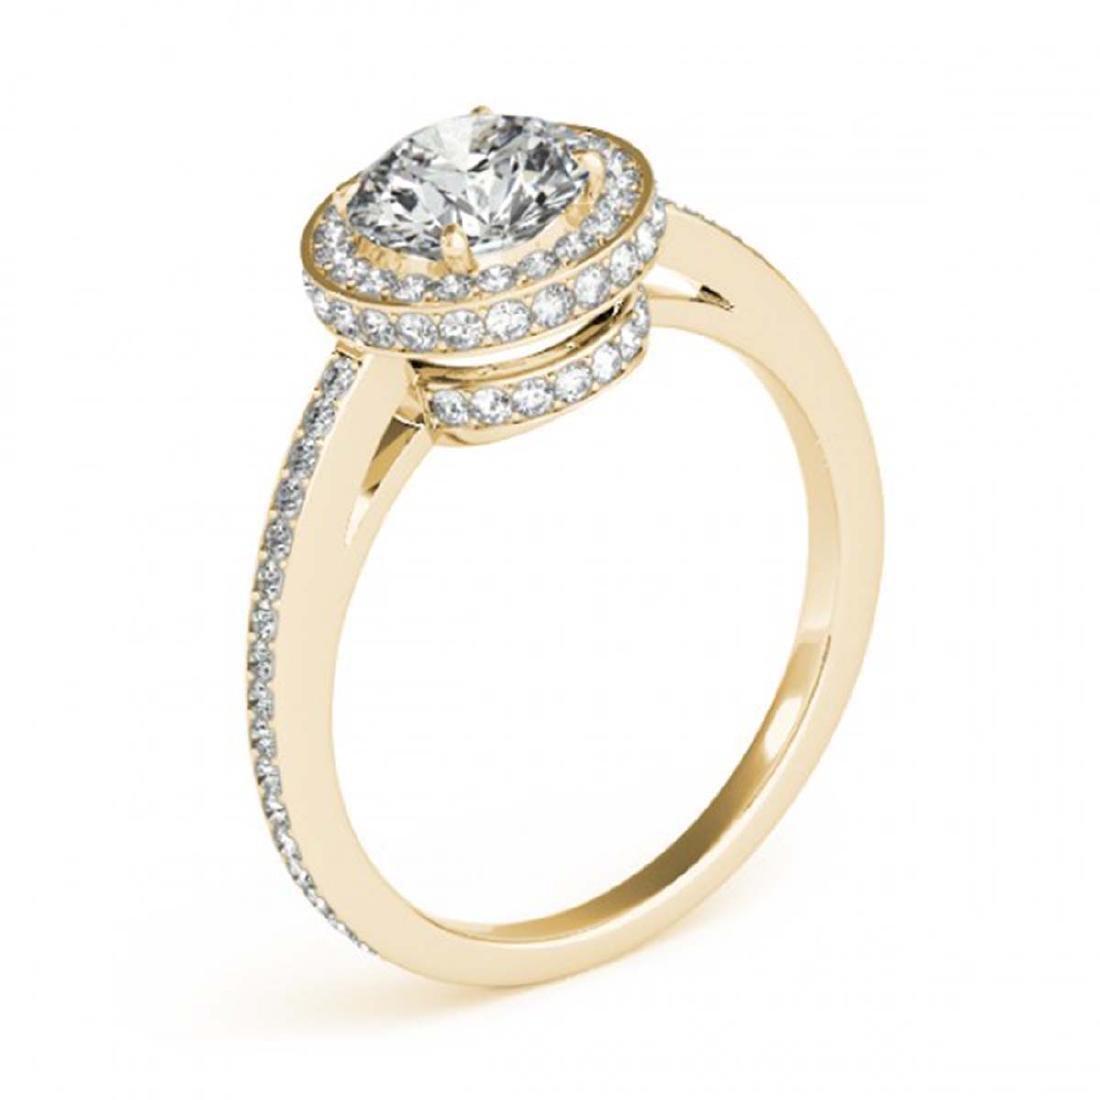 1.25 ctw VS/SI Diamond Solitaire Halo Ring 14K Yellow - 3